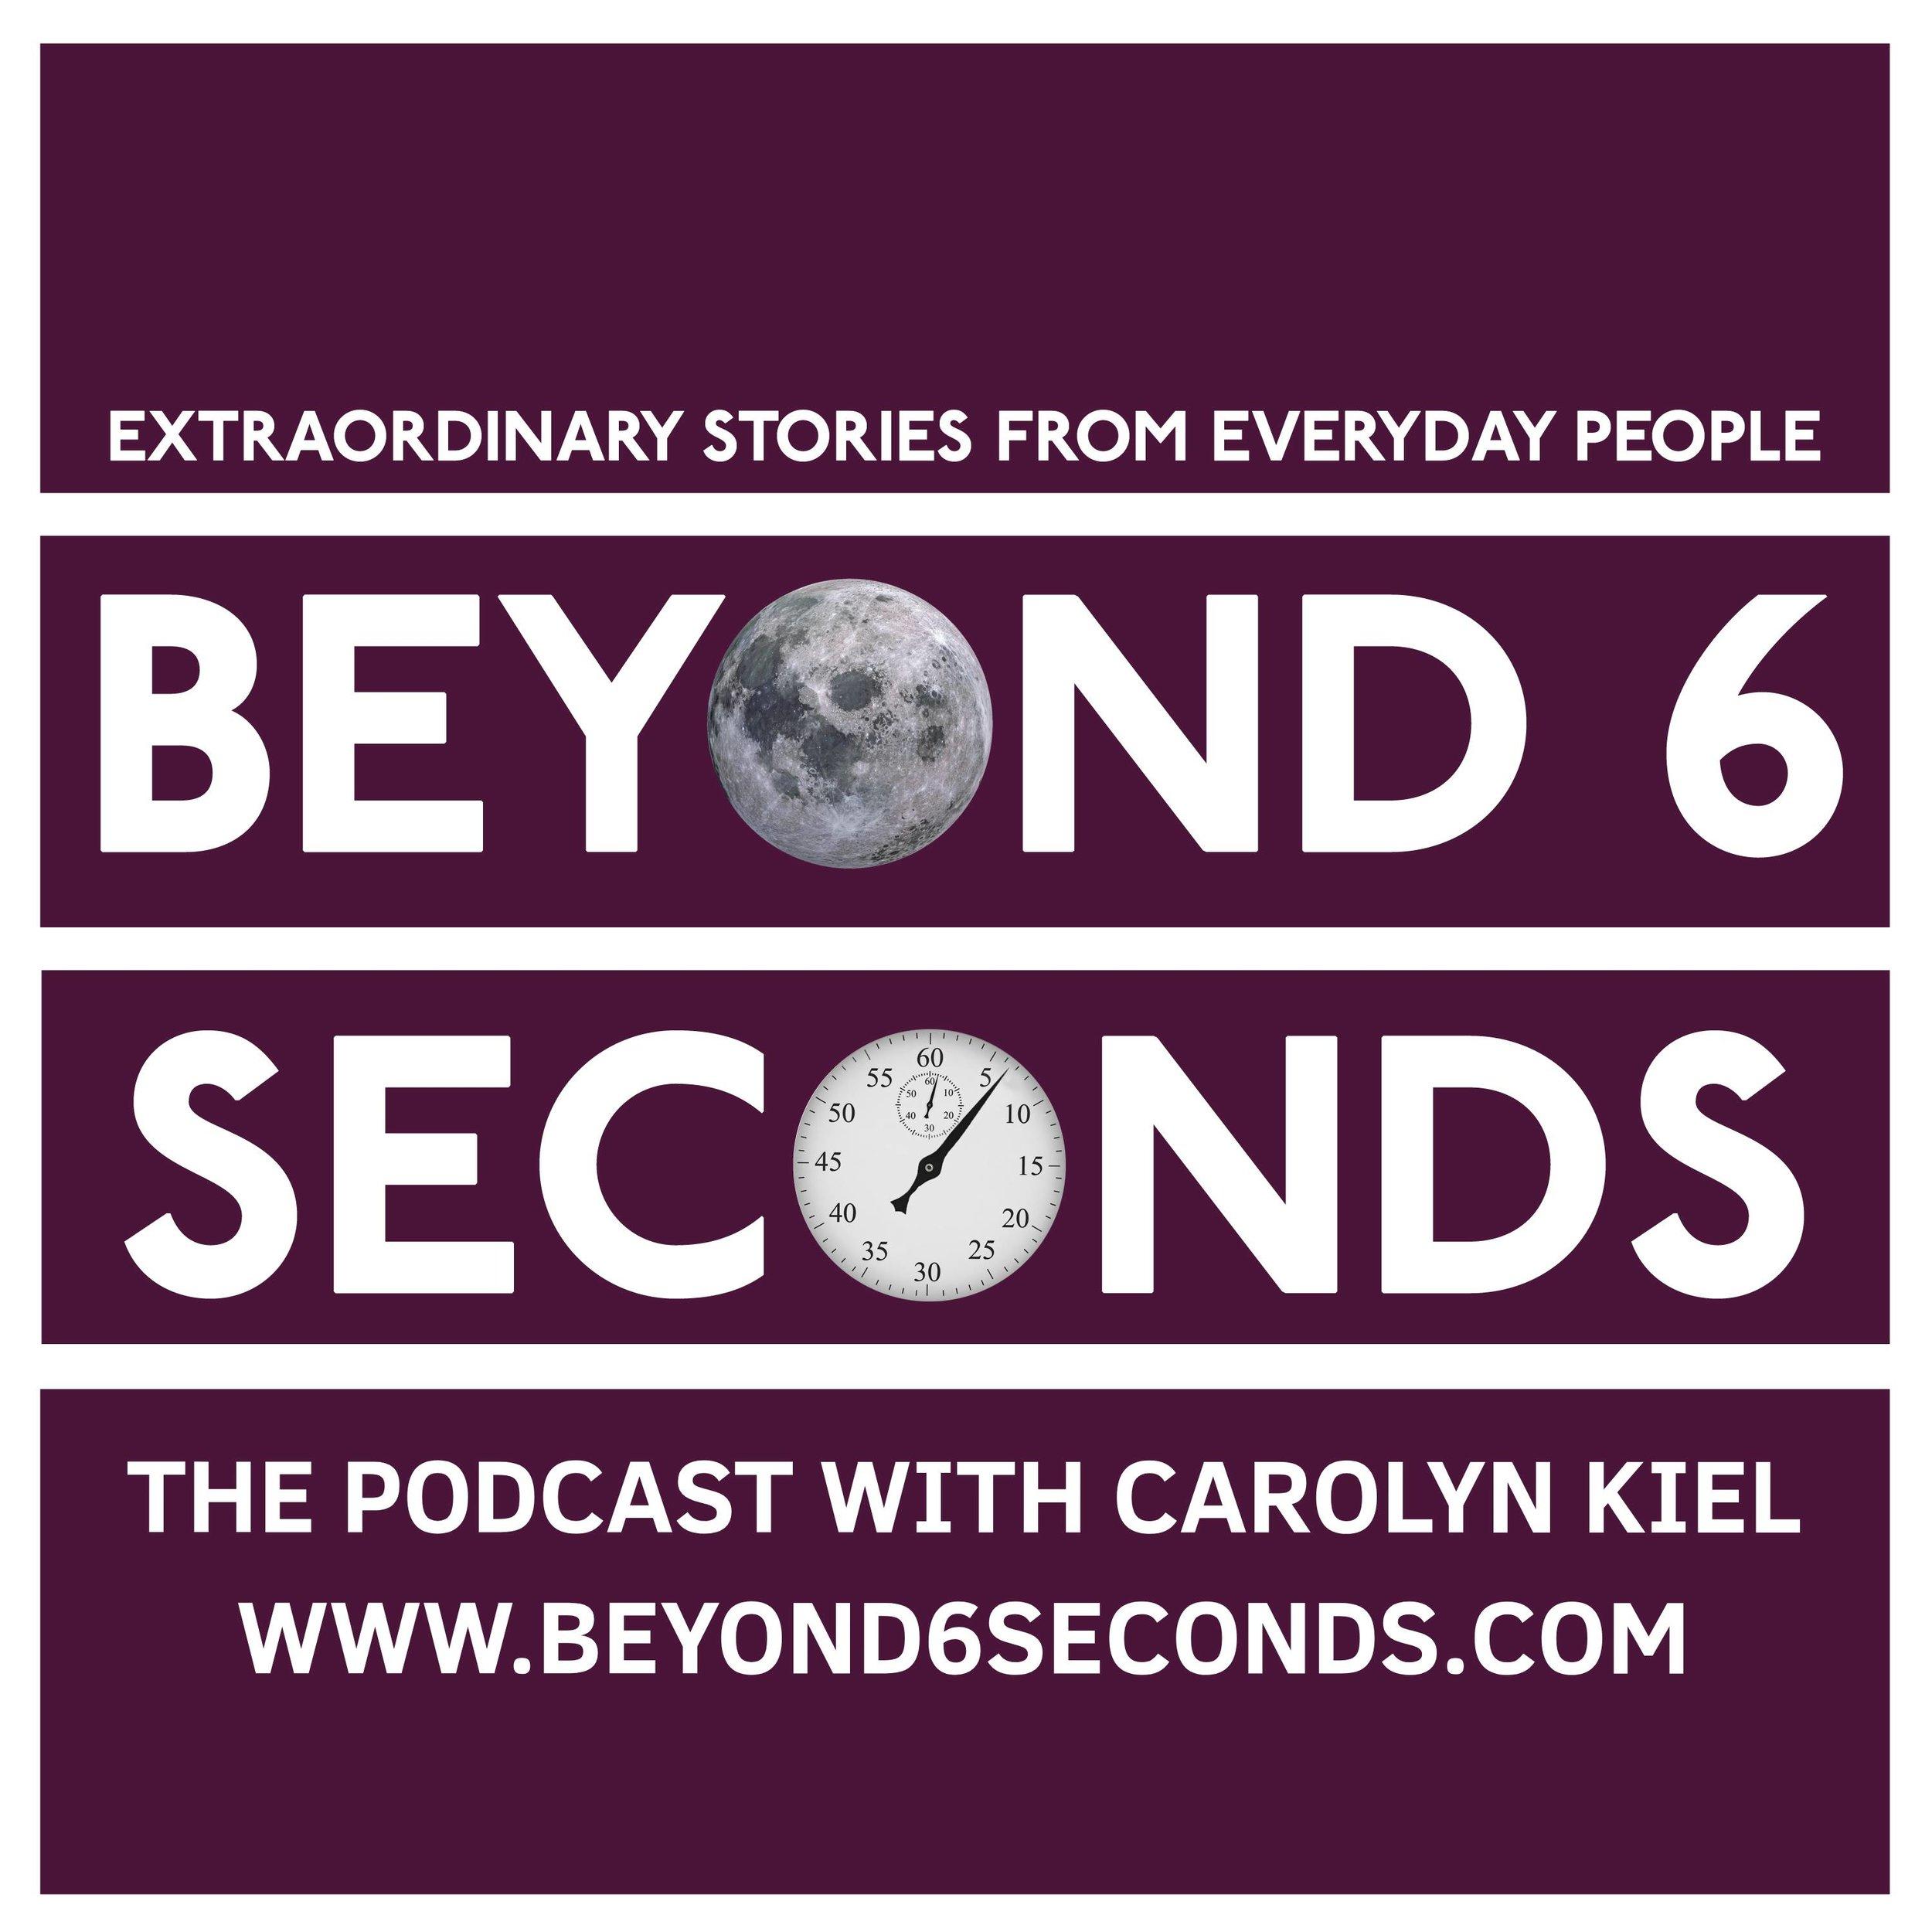 BEYOND 6 SECONDS logo.jpg